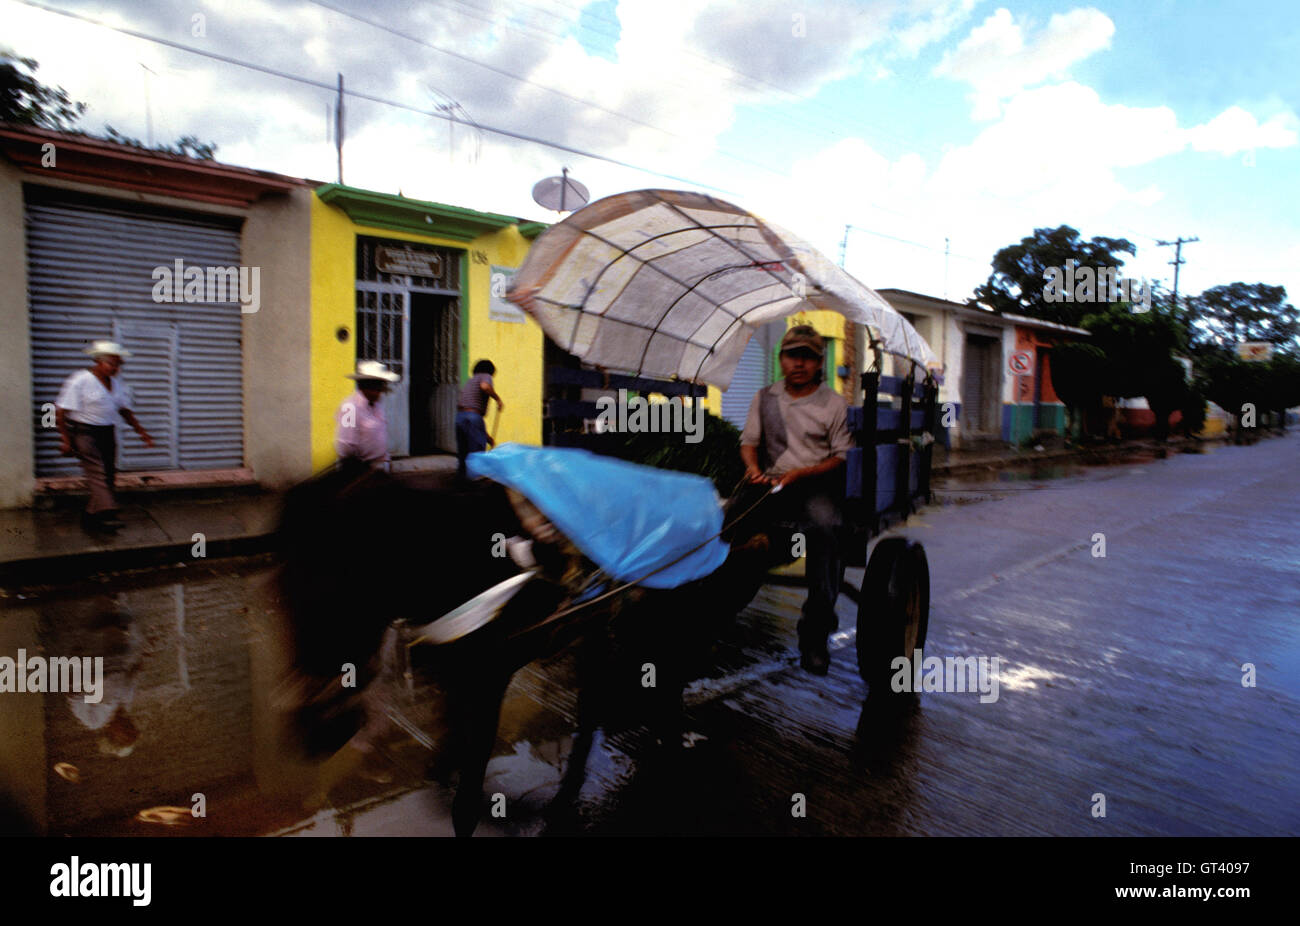 dbcfe518b4 Farmer traveling to the ancient market village of Zaachila near Oaxaca  Mexico